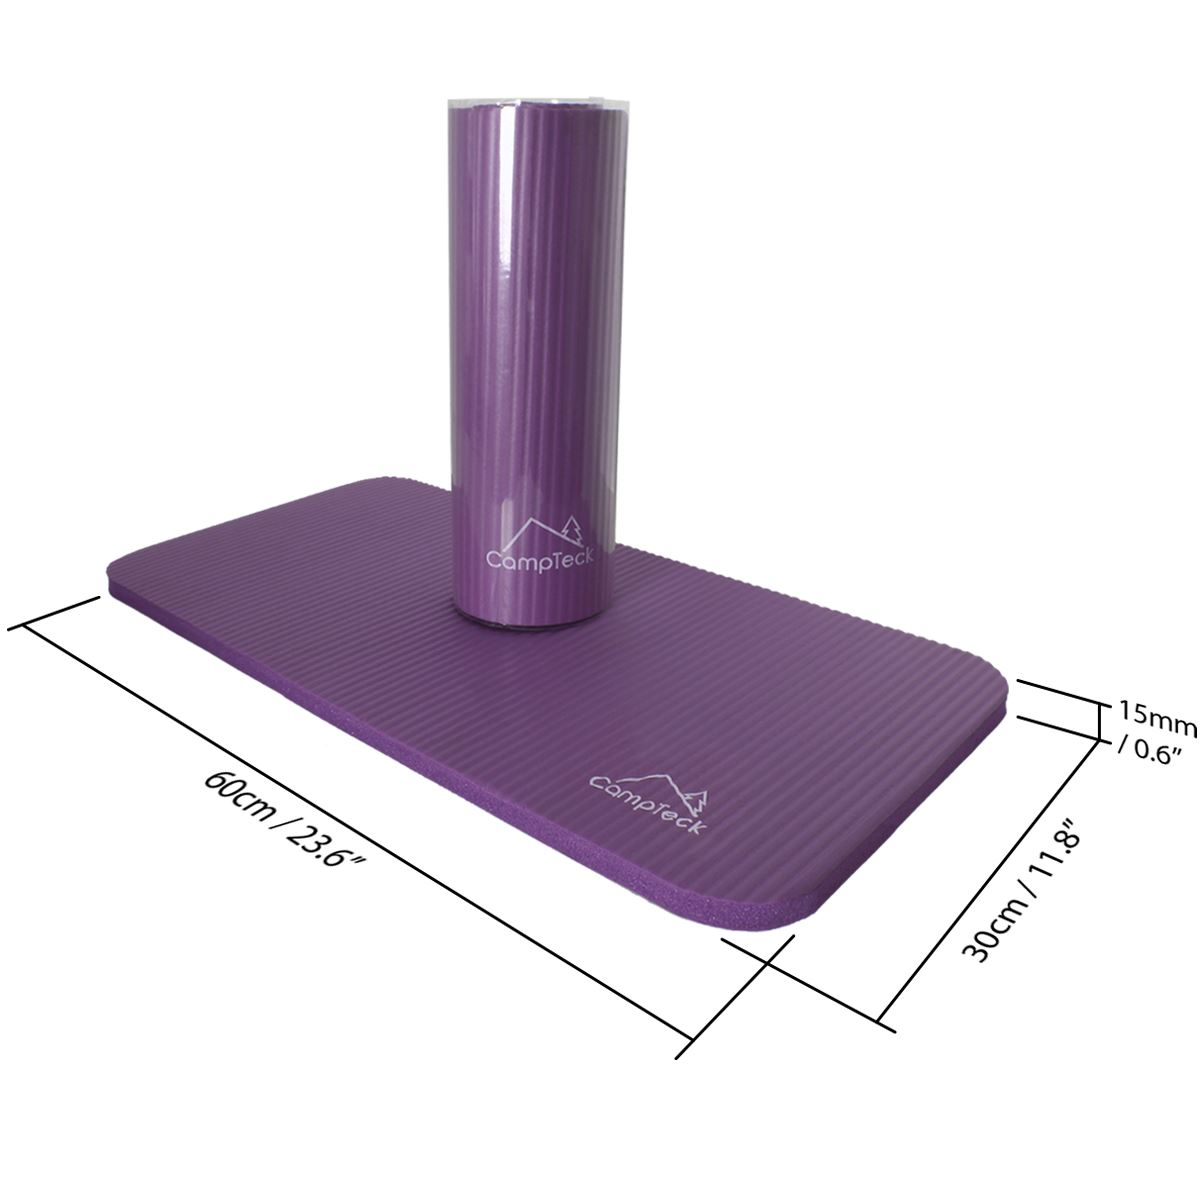 Yoga Knee Pad Cushion Soft Foam Yoga Knee Mat Support Gym Fitness ExerciseJC SJ